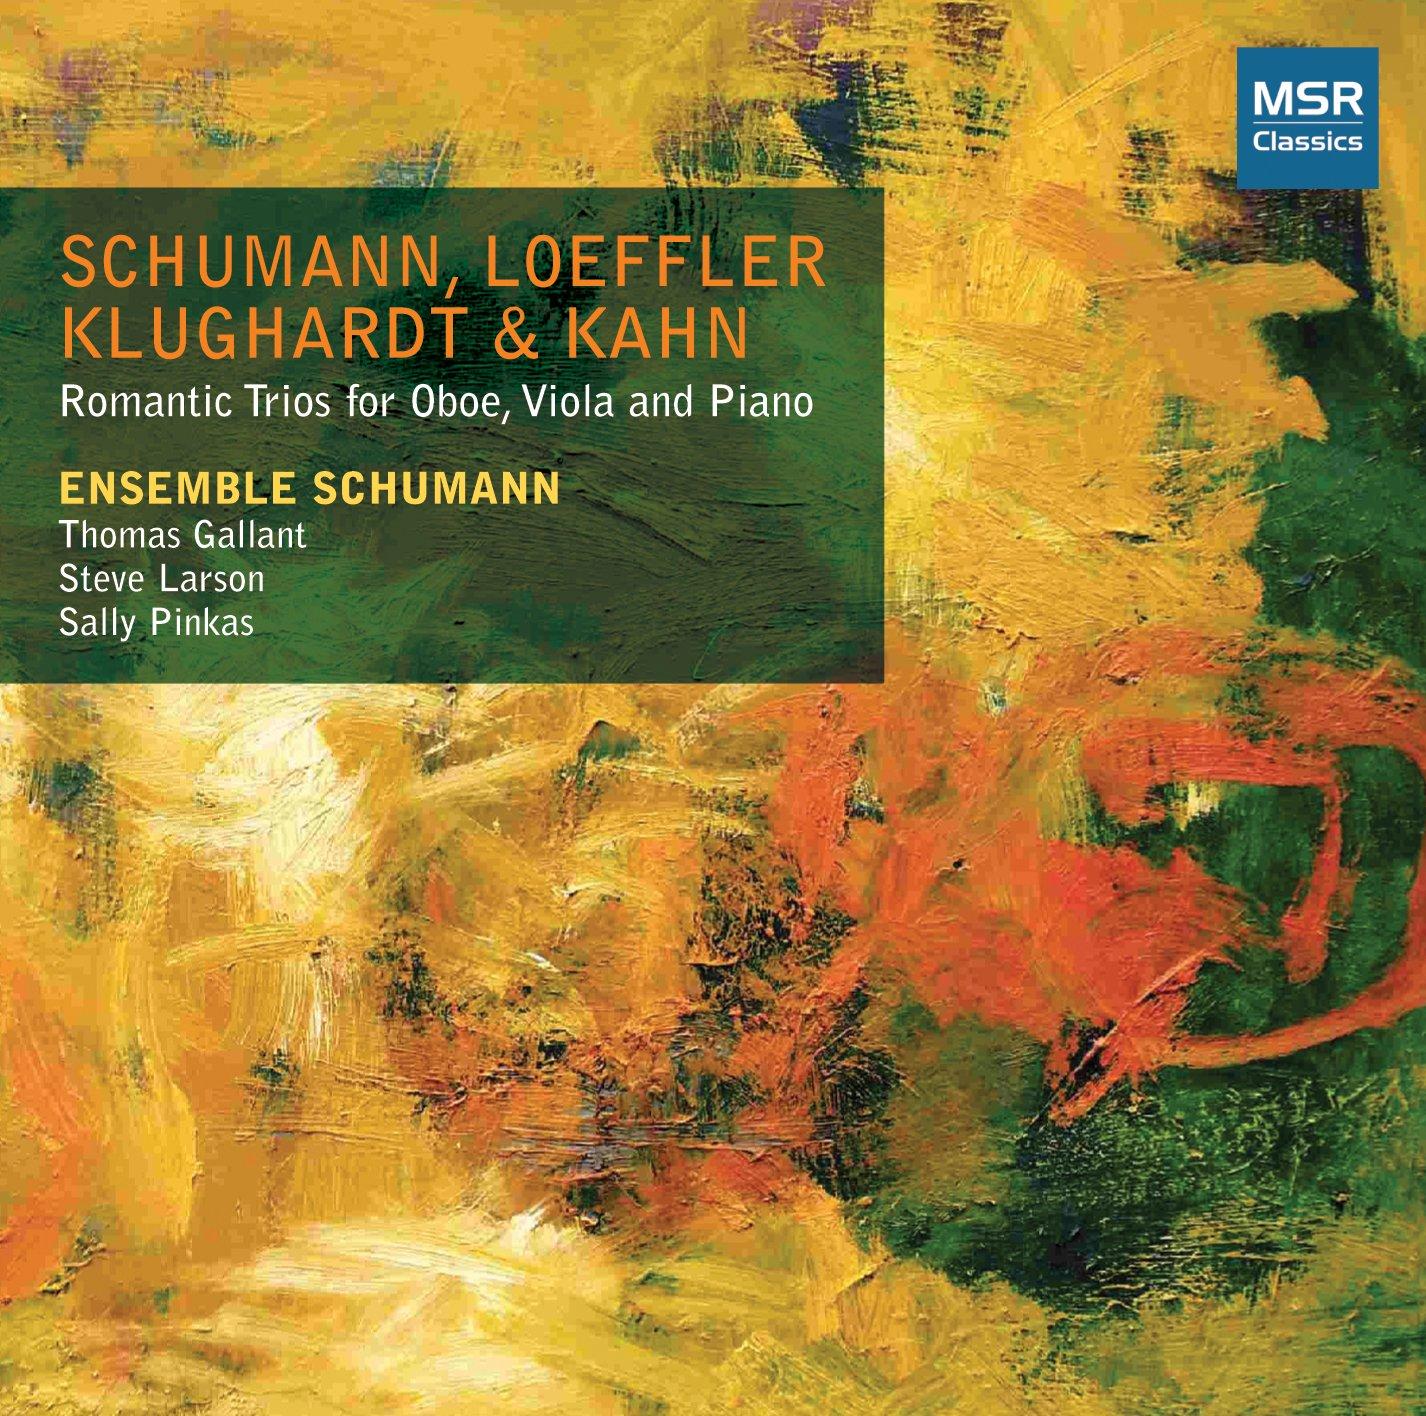 CD : ENSEMBLE SCHUMANN - THOMAS GALLANT (OBOE) - STEVE LARSON (VIOLA) - SALLY PINKAS (PIANO) - Romantic Trios For Oboe Viola & Piano (CD)